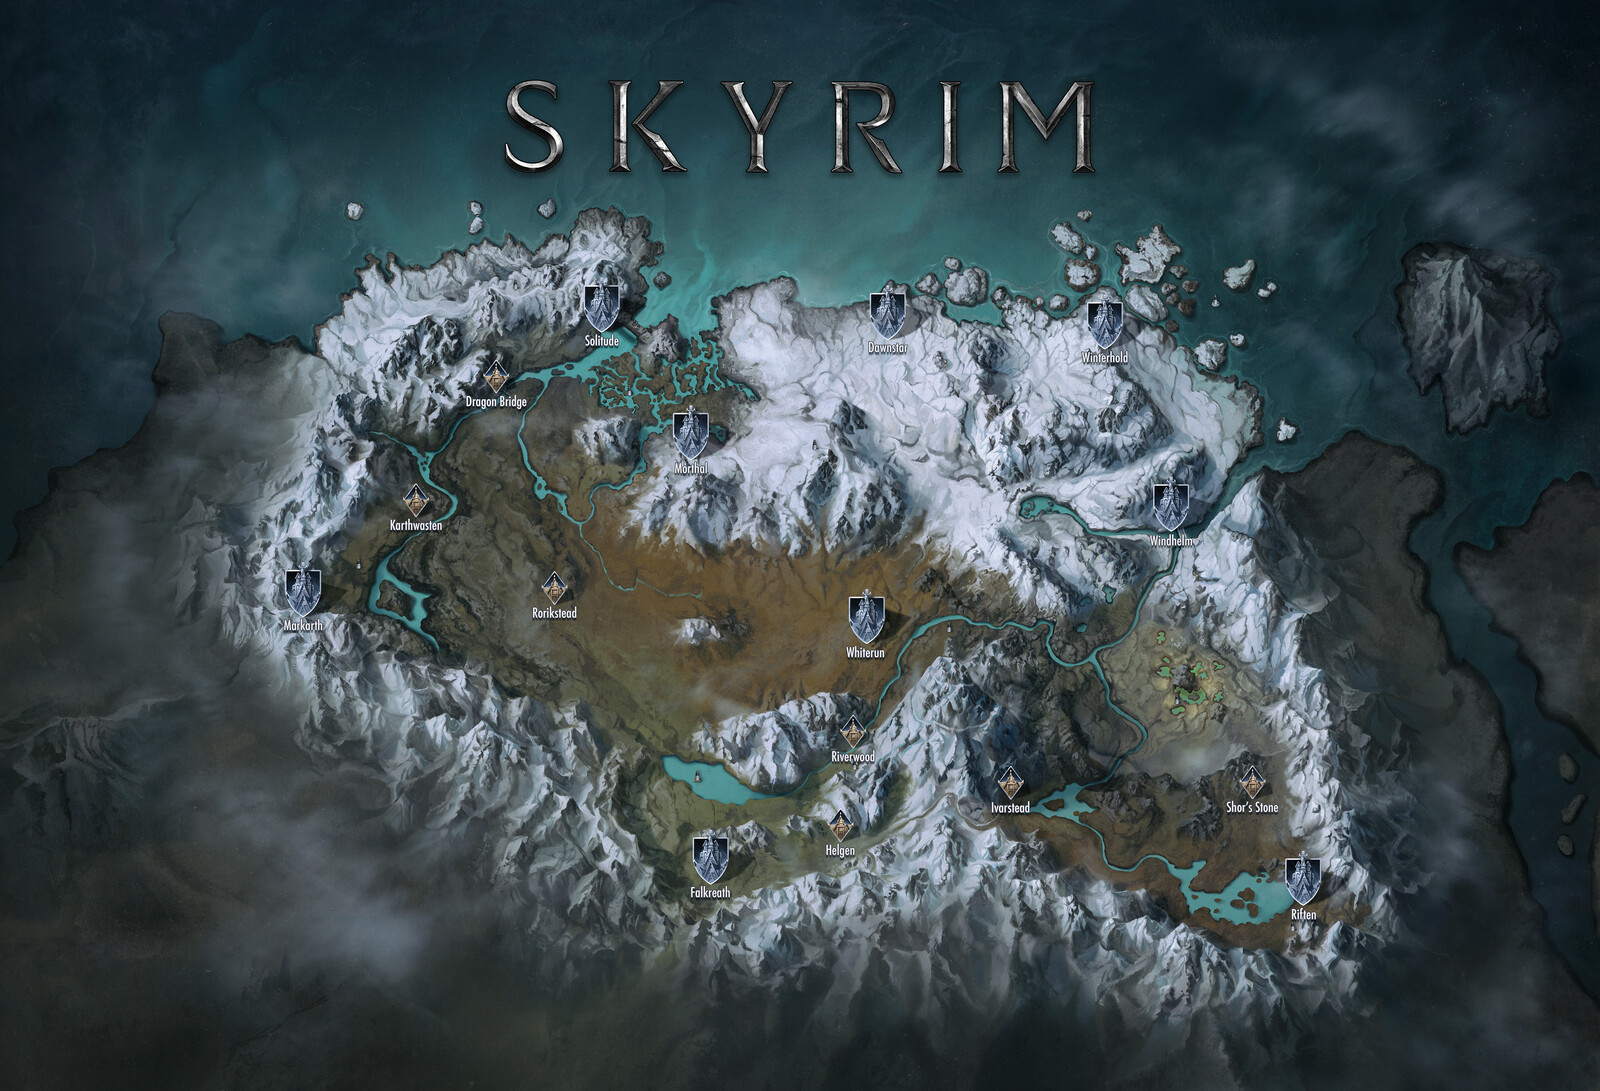 Skyrim World Map